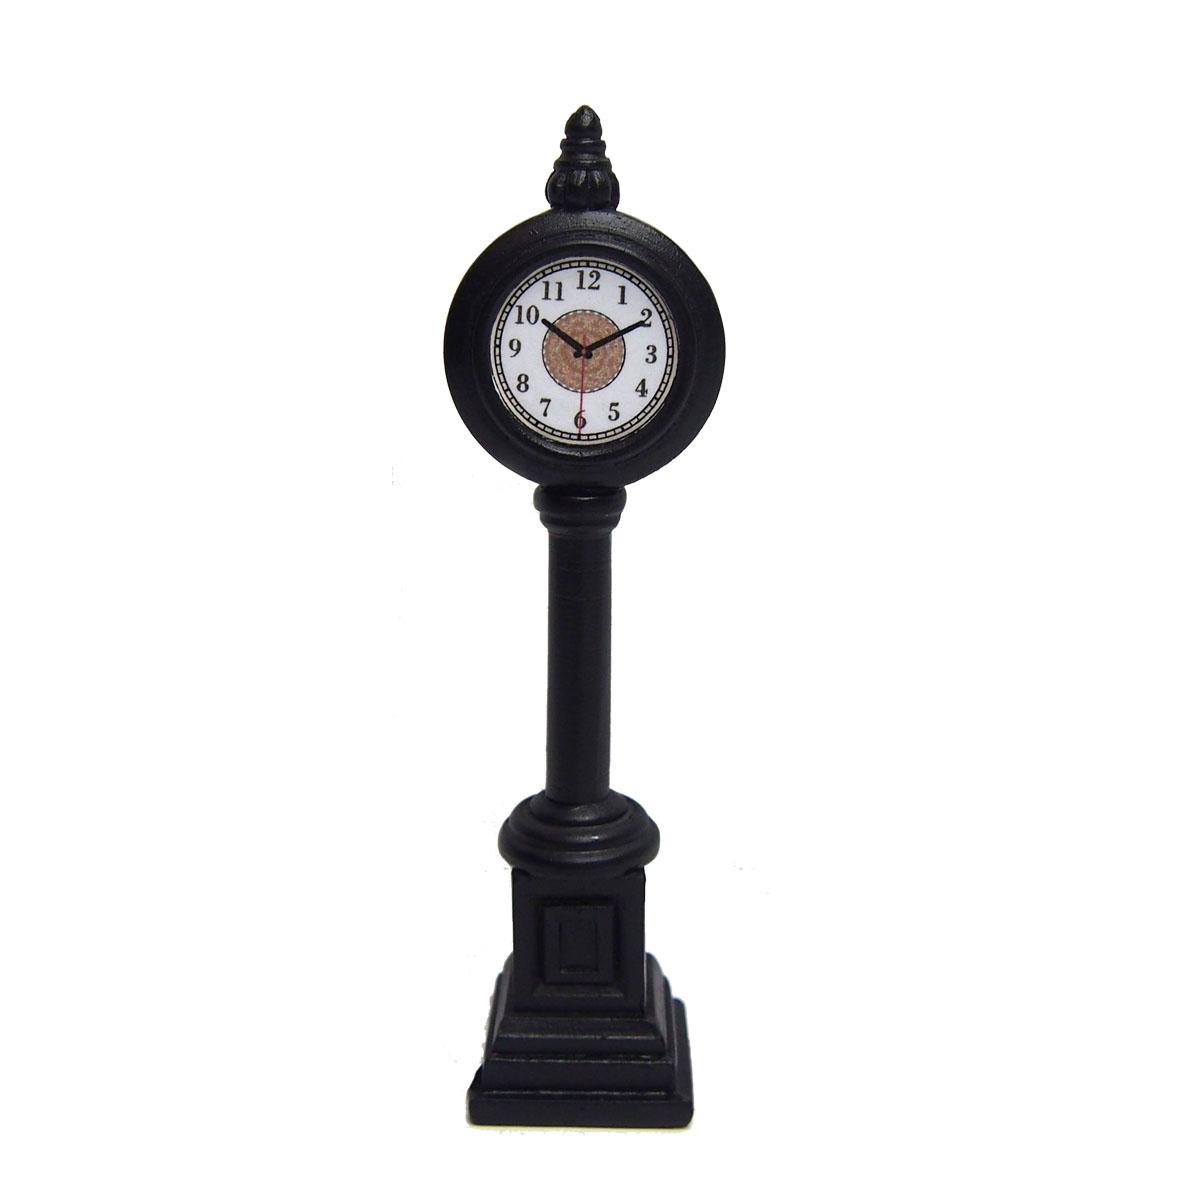 "Clock for Christmas Village - 4.2"" - Black"